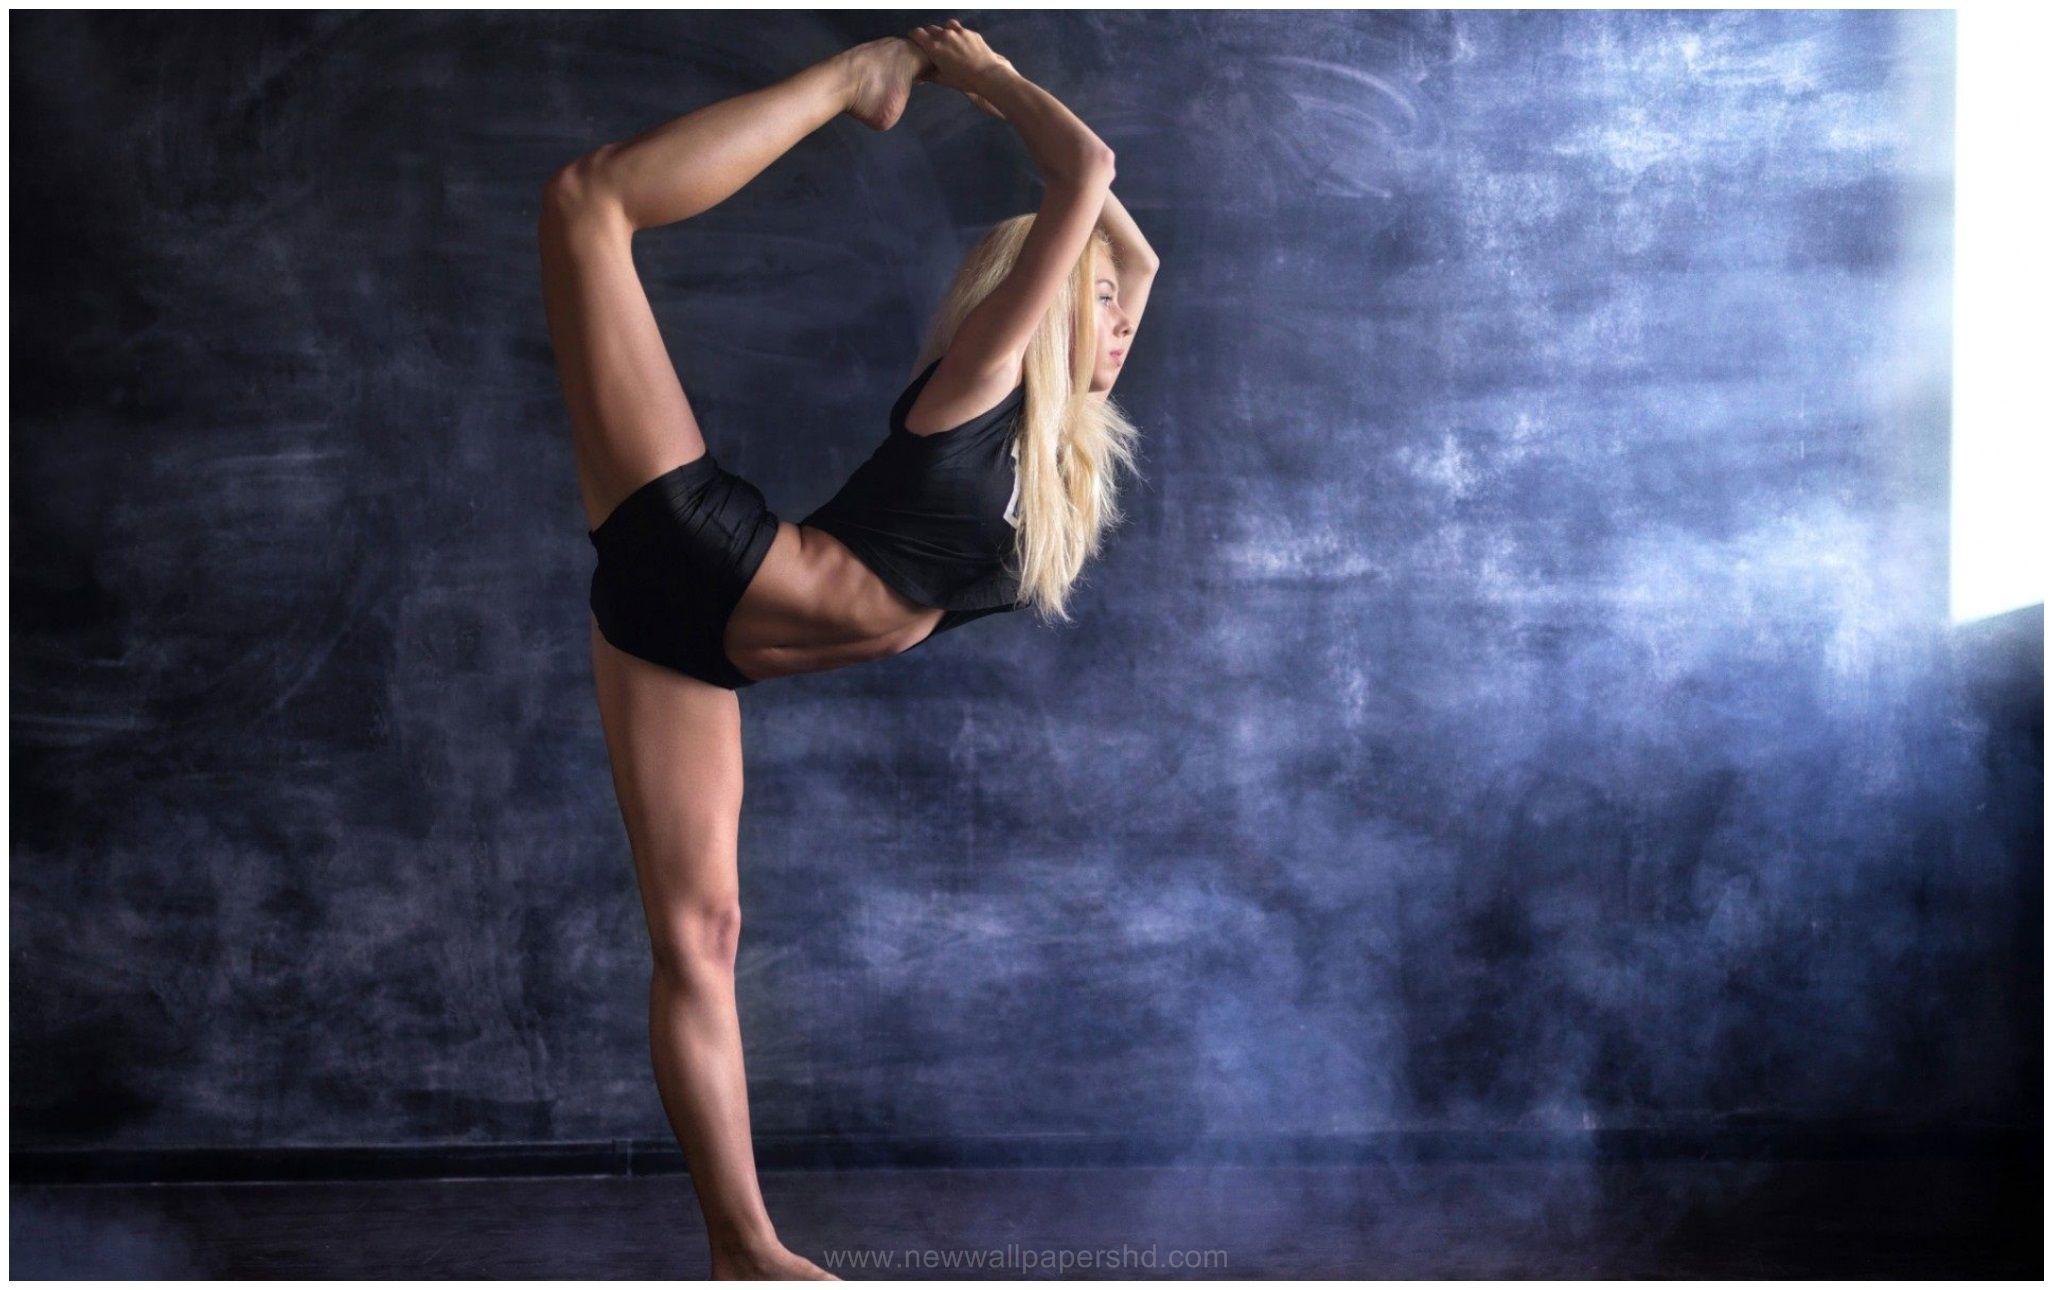 Female Athlete Girl Hd Wallpaper 9 Wallpapers Hd Female Athletes Female Fitness Instagram Fit Women